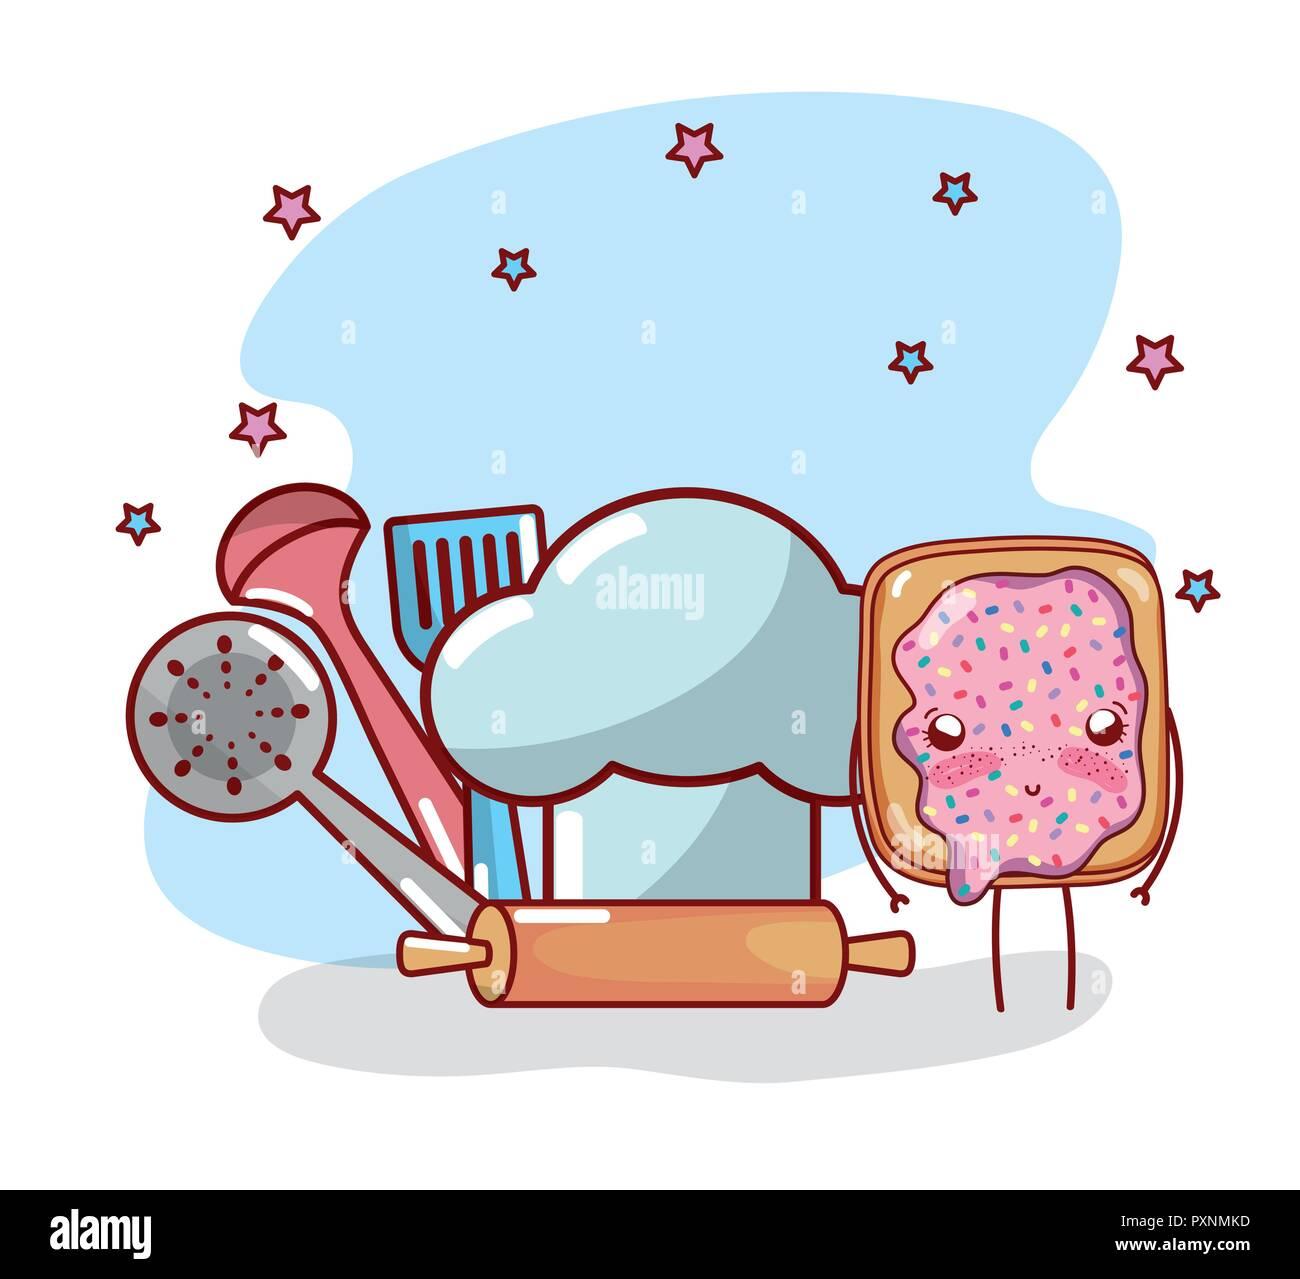 Kitchen Items Cartoon Kawaii Cartoon Stock Vector Image Art Alamy